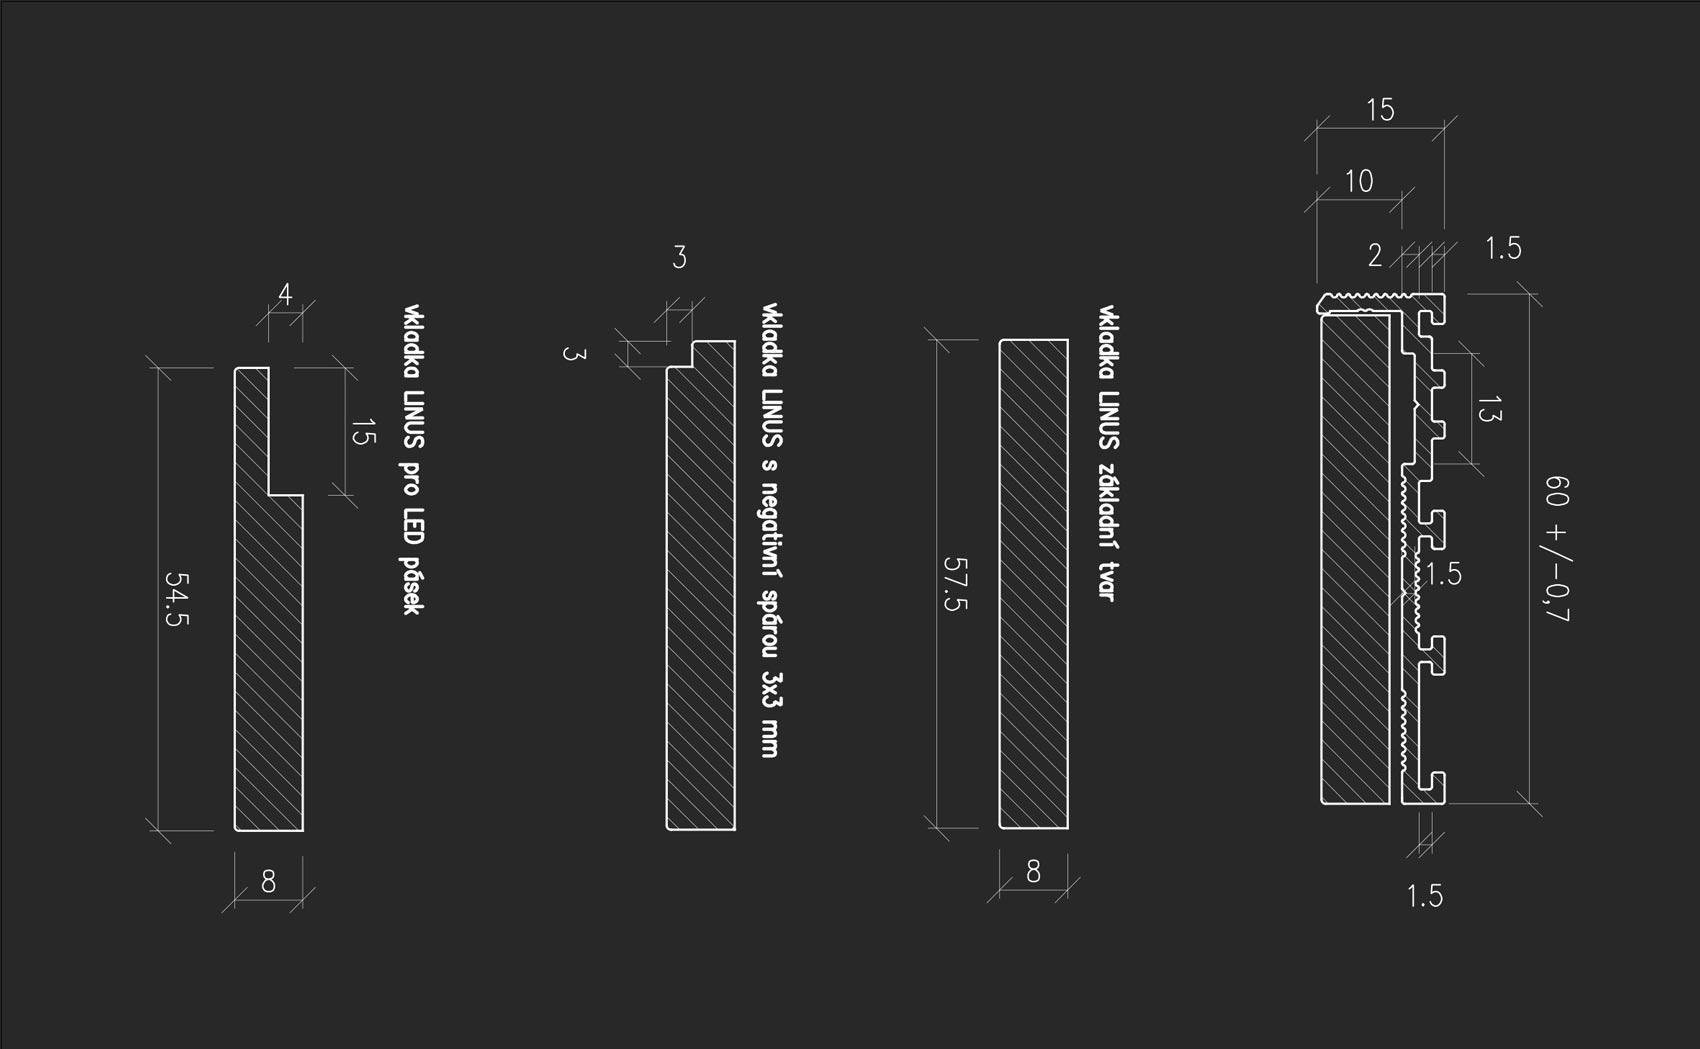 Okótované typy vkladky pro skrytou soklovou lištu LINUS 15 a 13